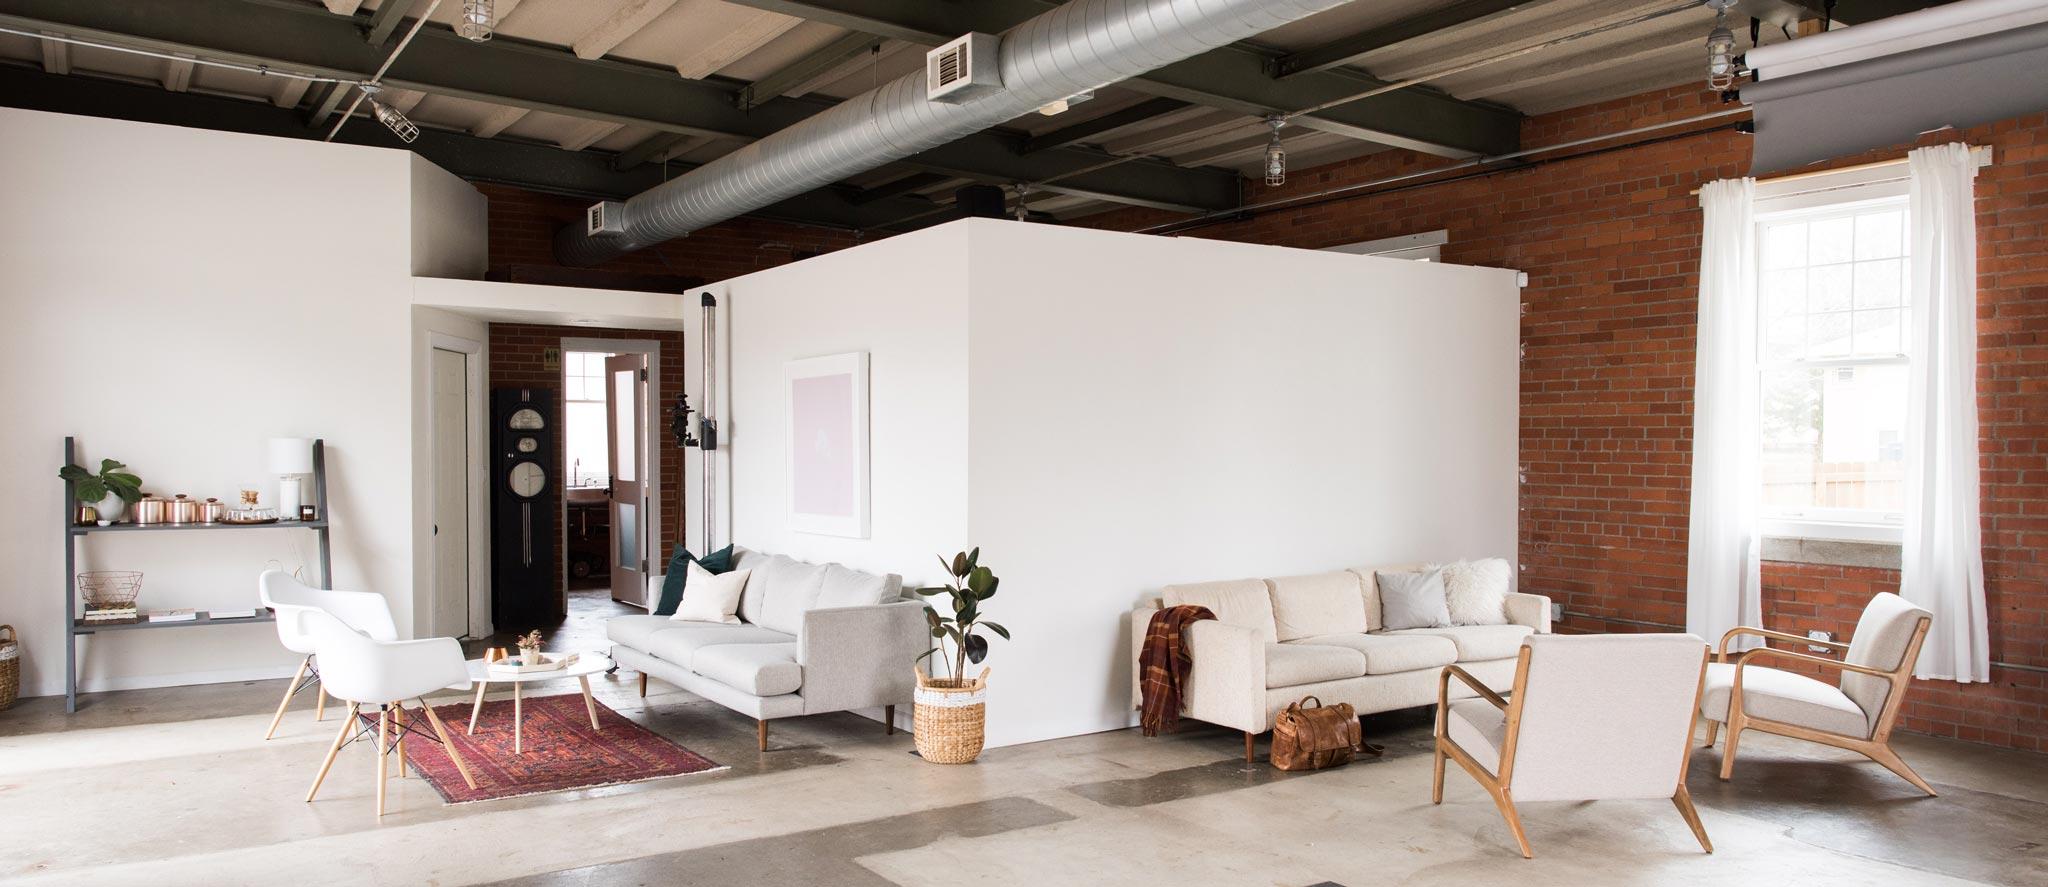 water-house-photography-studio-rental